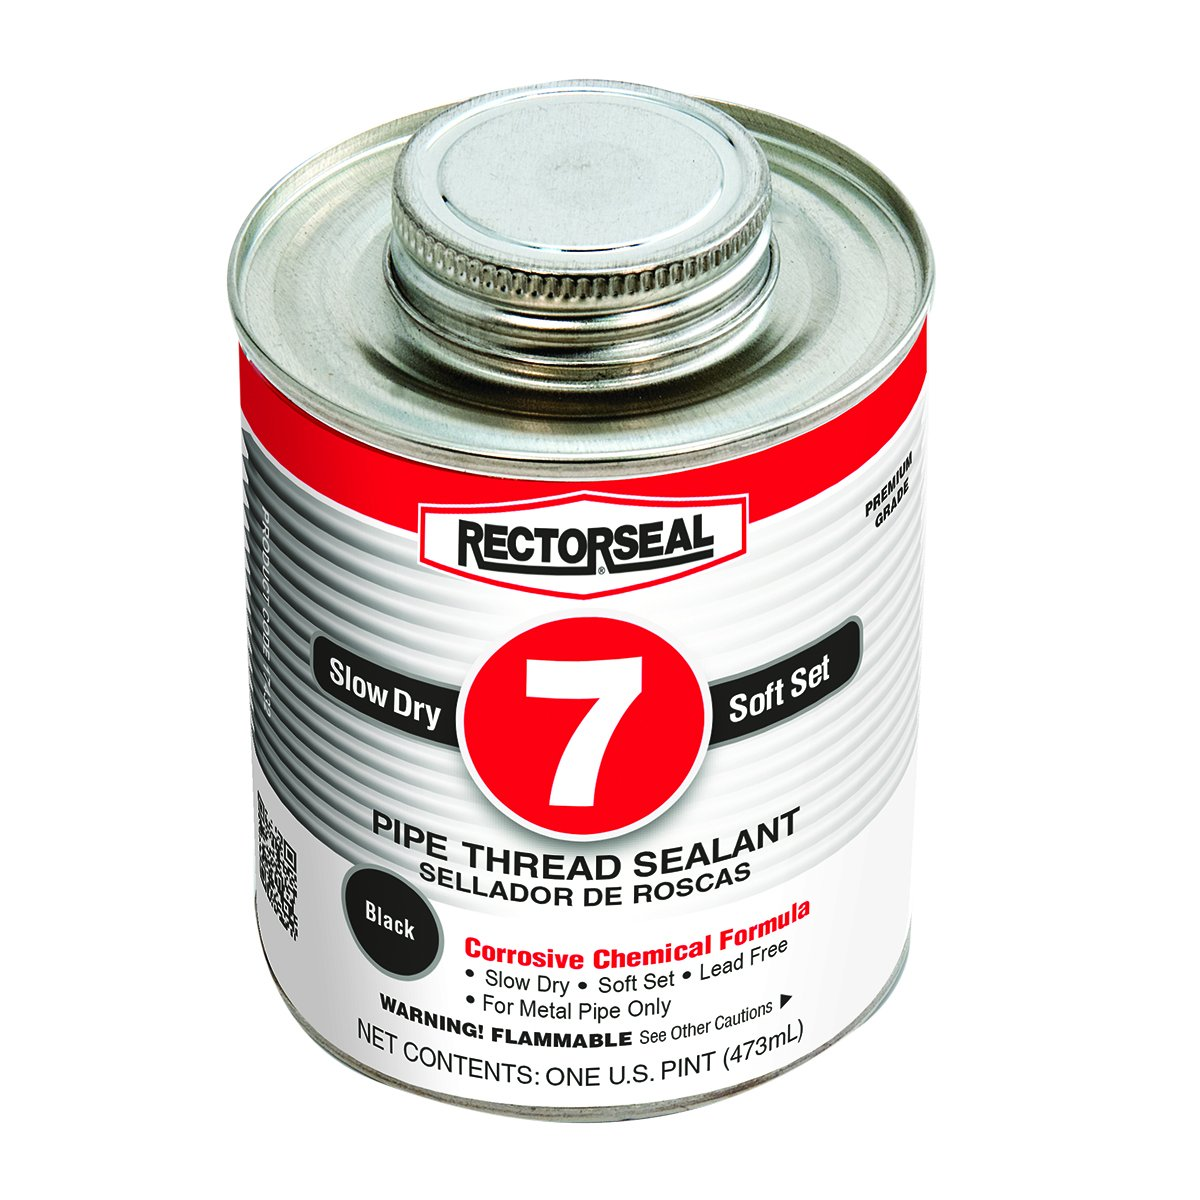 Rectorseal 17432 No. 7 Pipe Thread Sealant, 1 Pint Brush Top Can, Black